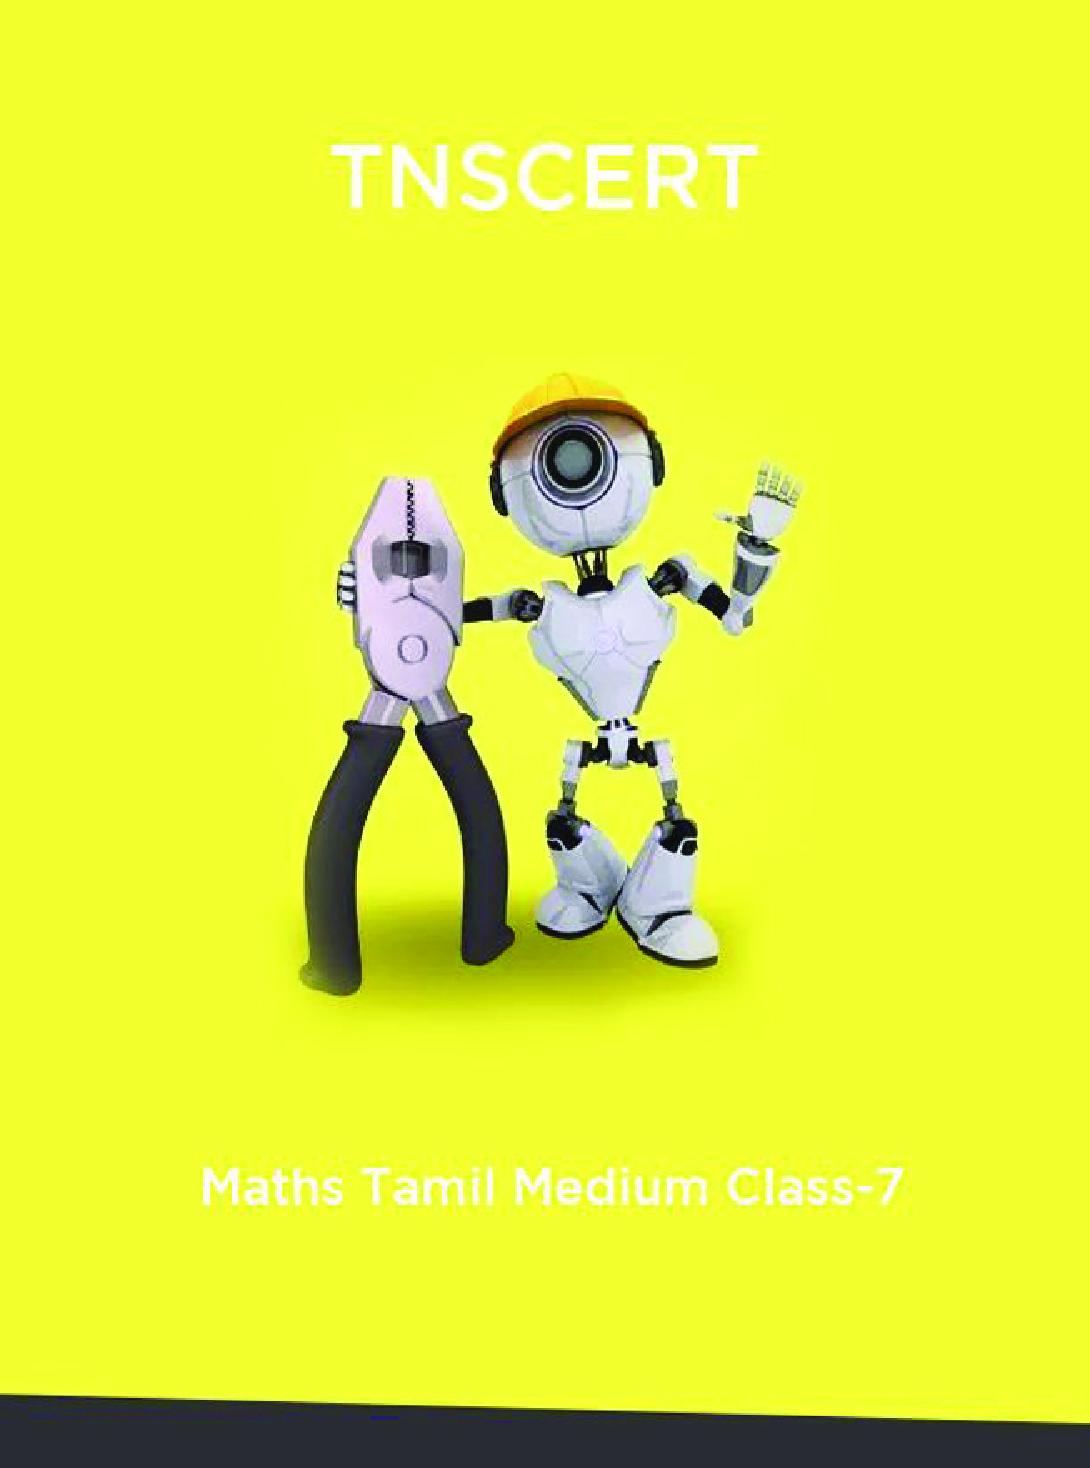 TNSCERT Maths Tamil Medium Class-7 - Page 1